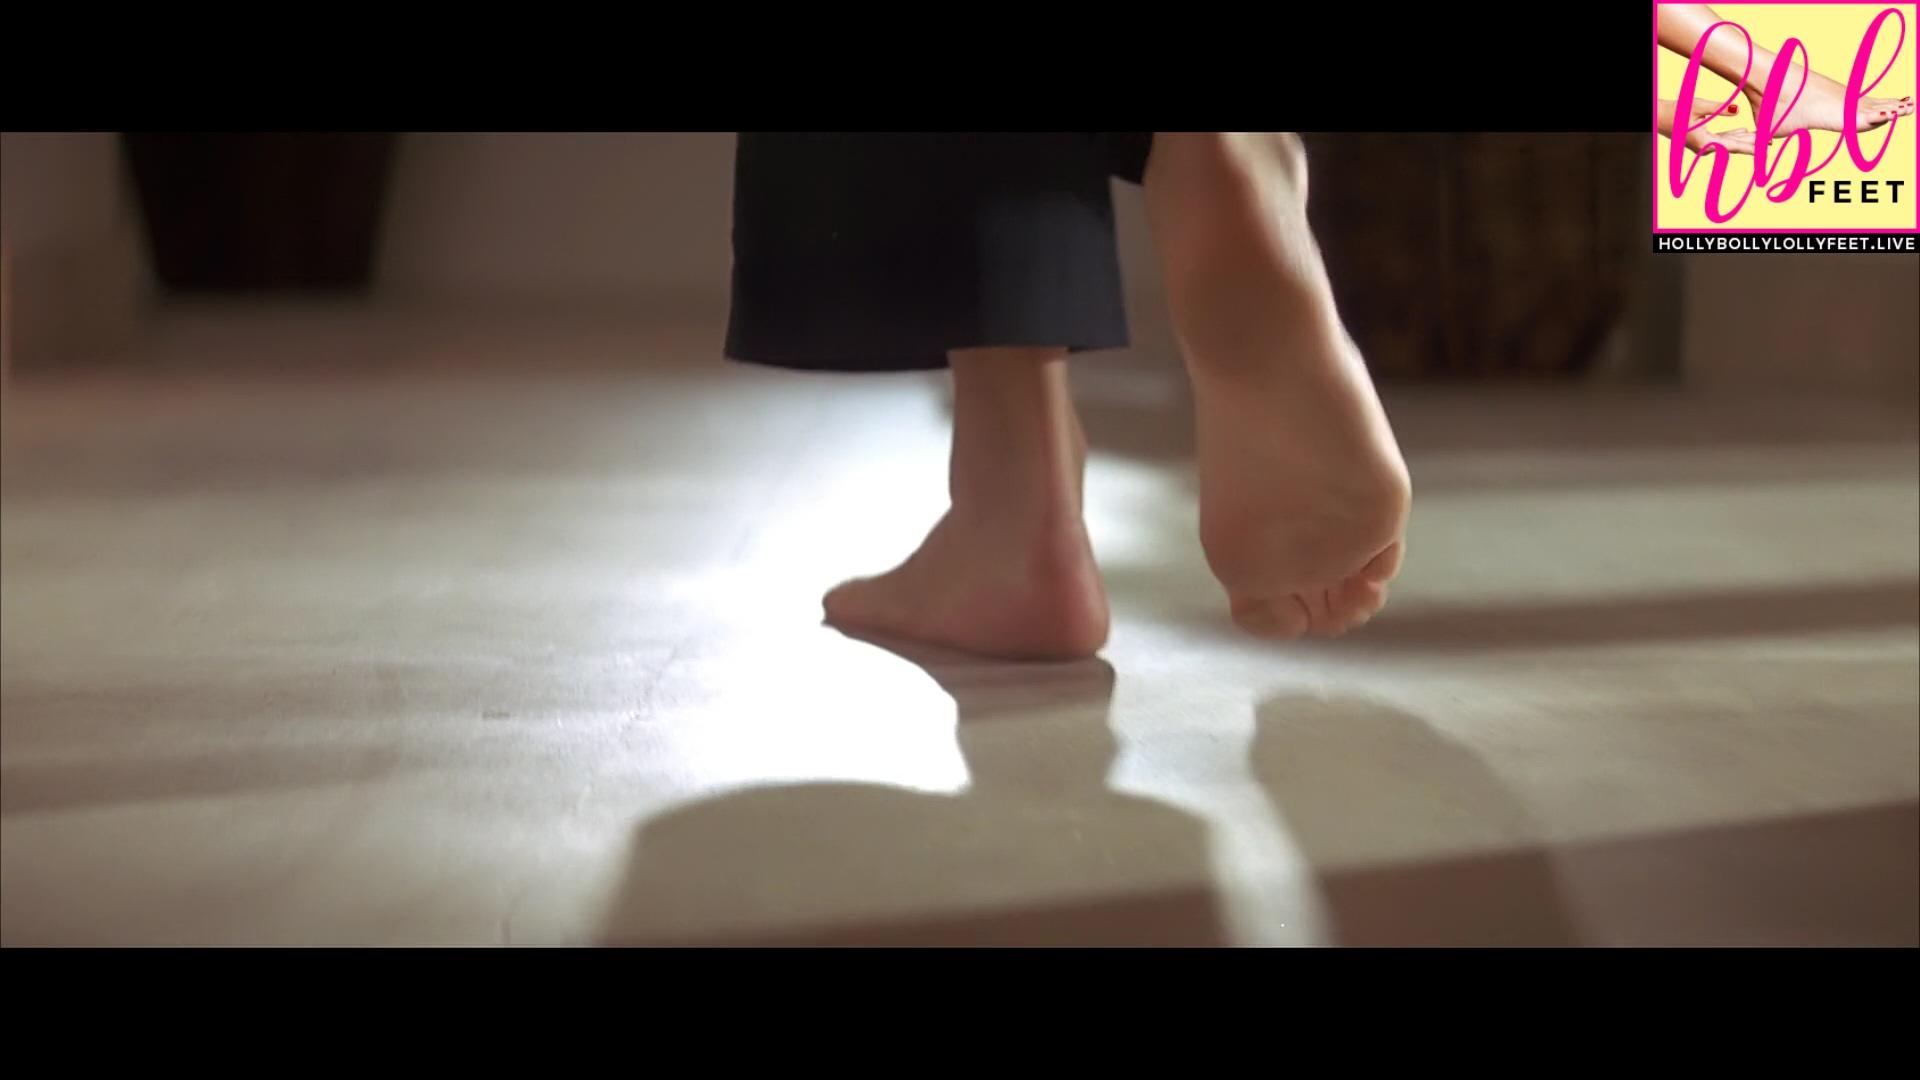 Thurman feet uma Bodies of